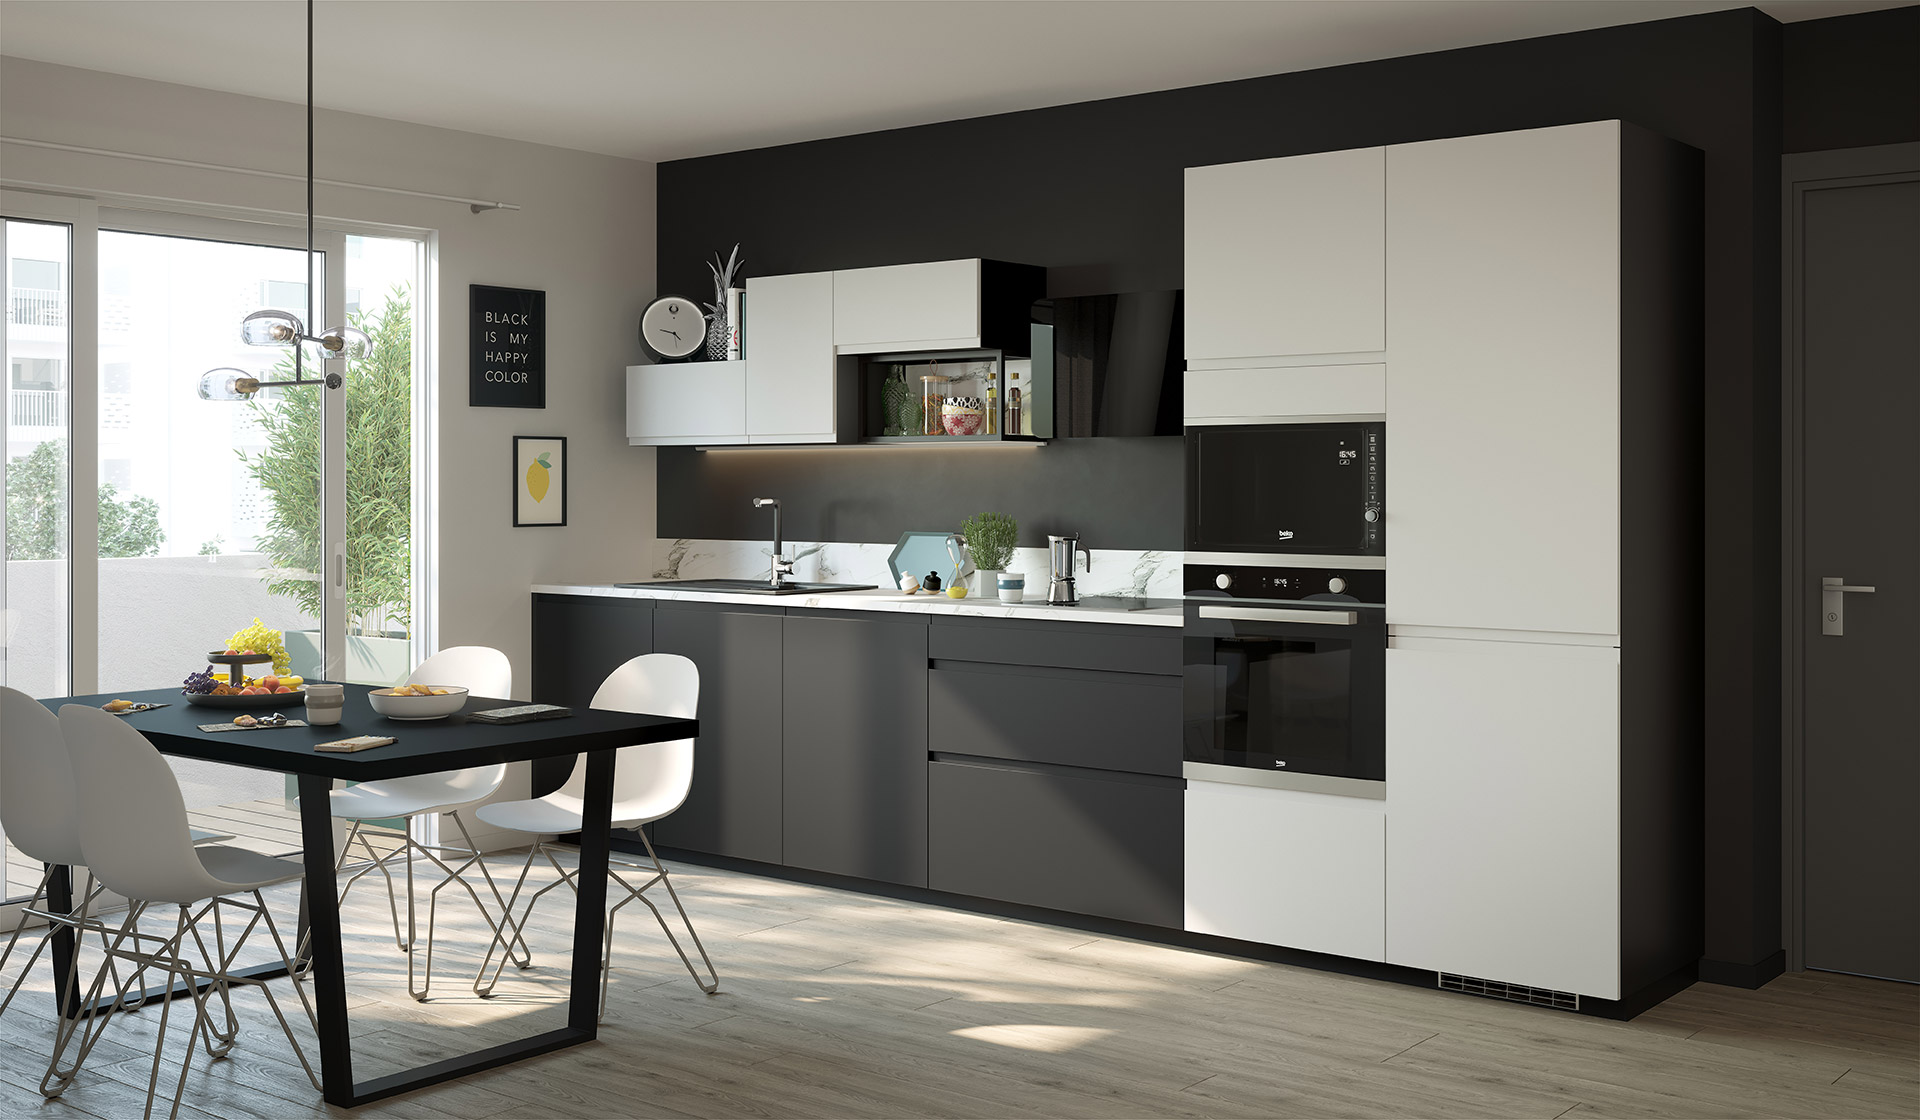 3D interior visualization of a kitchen set